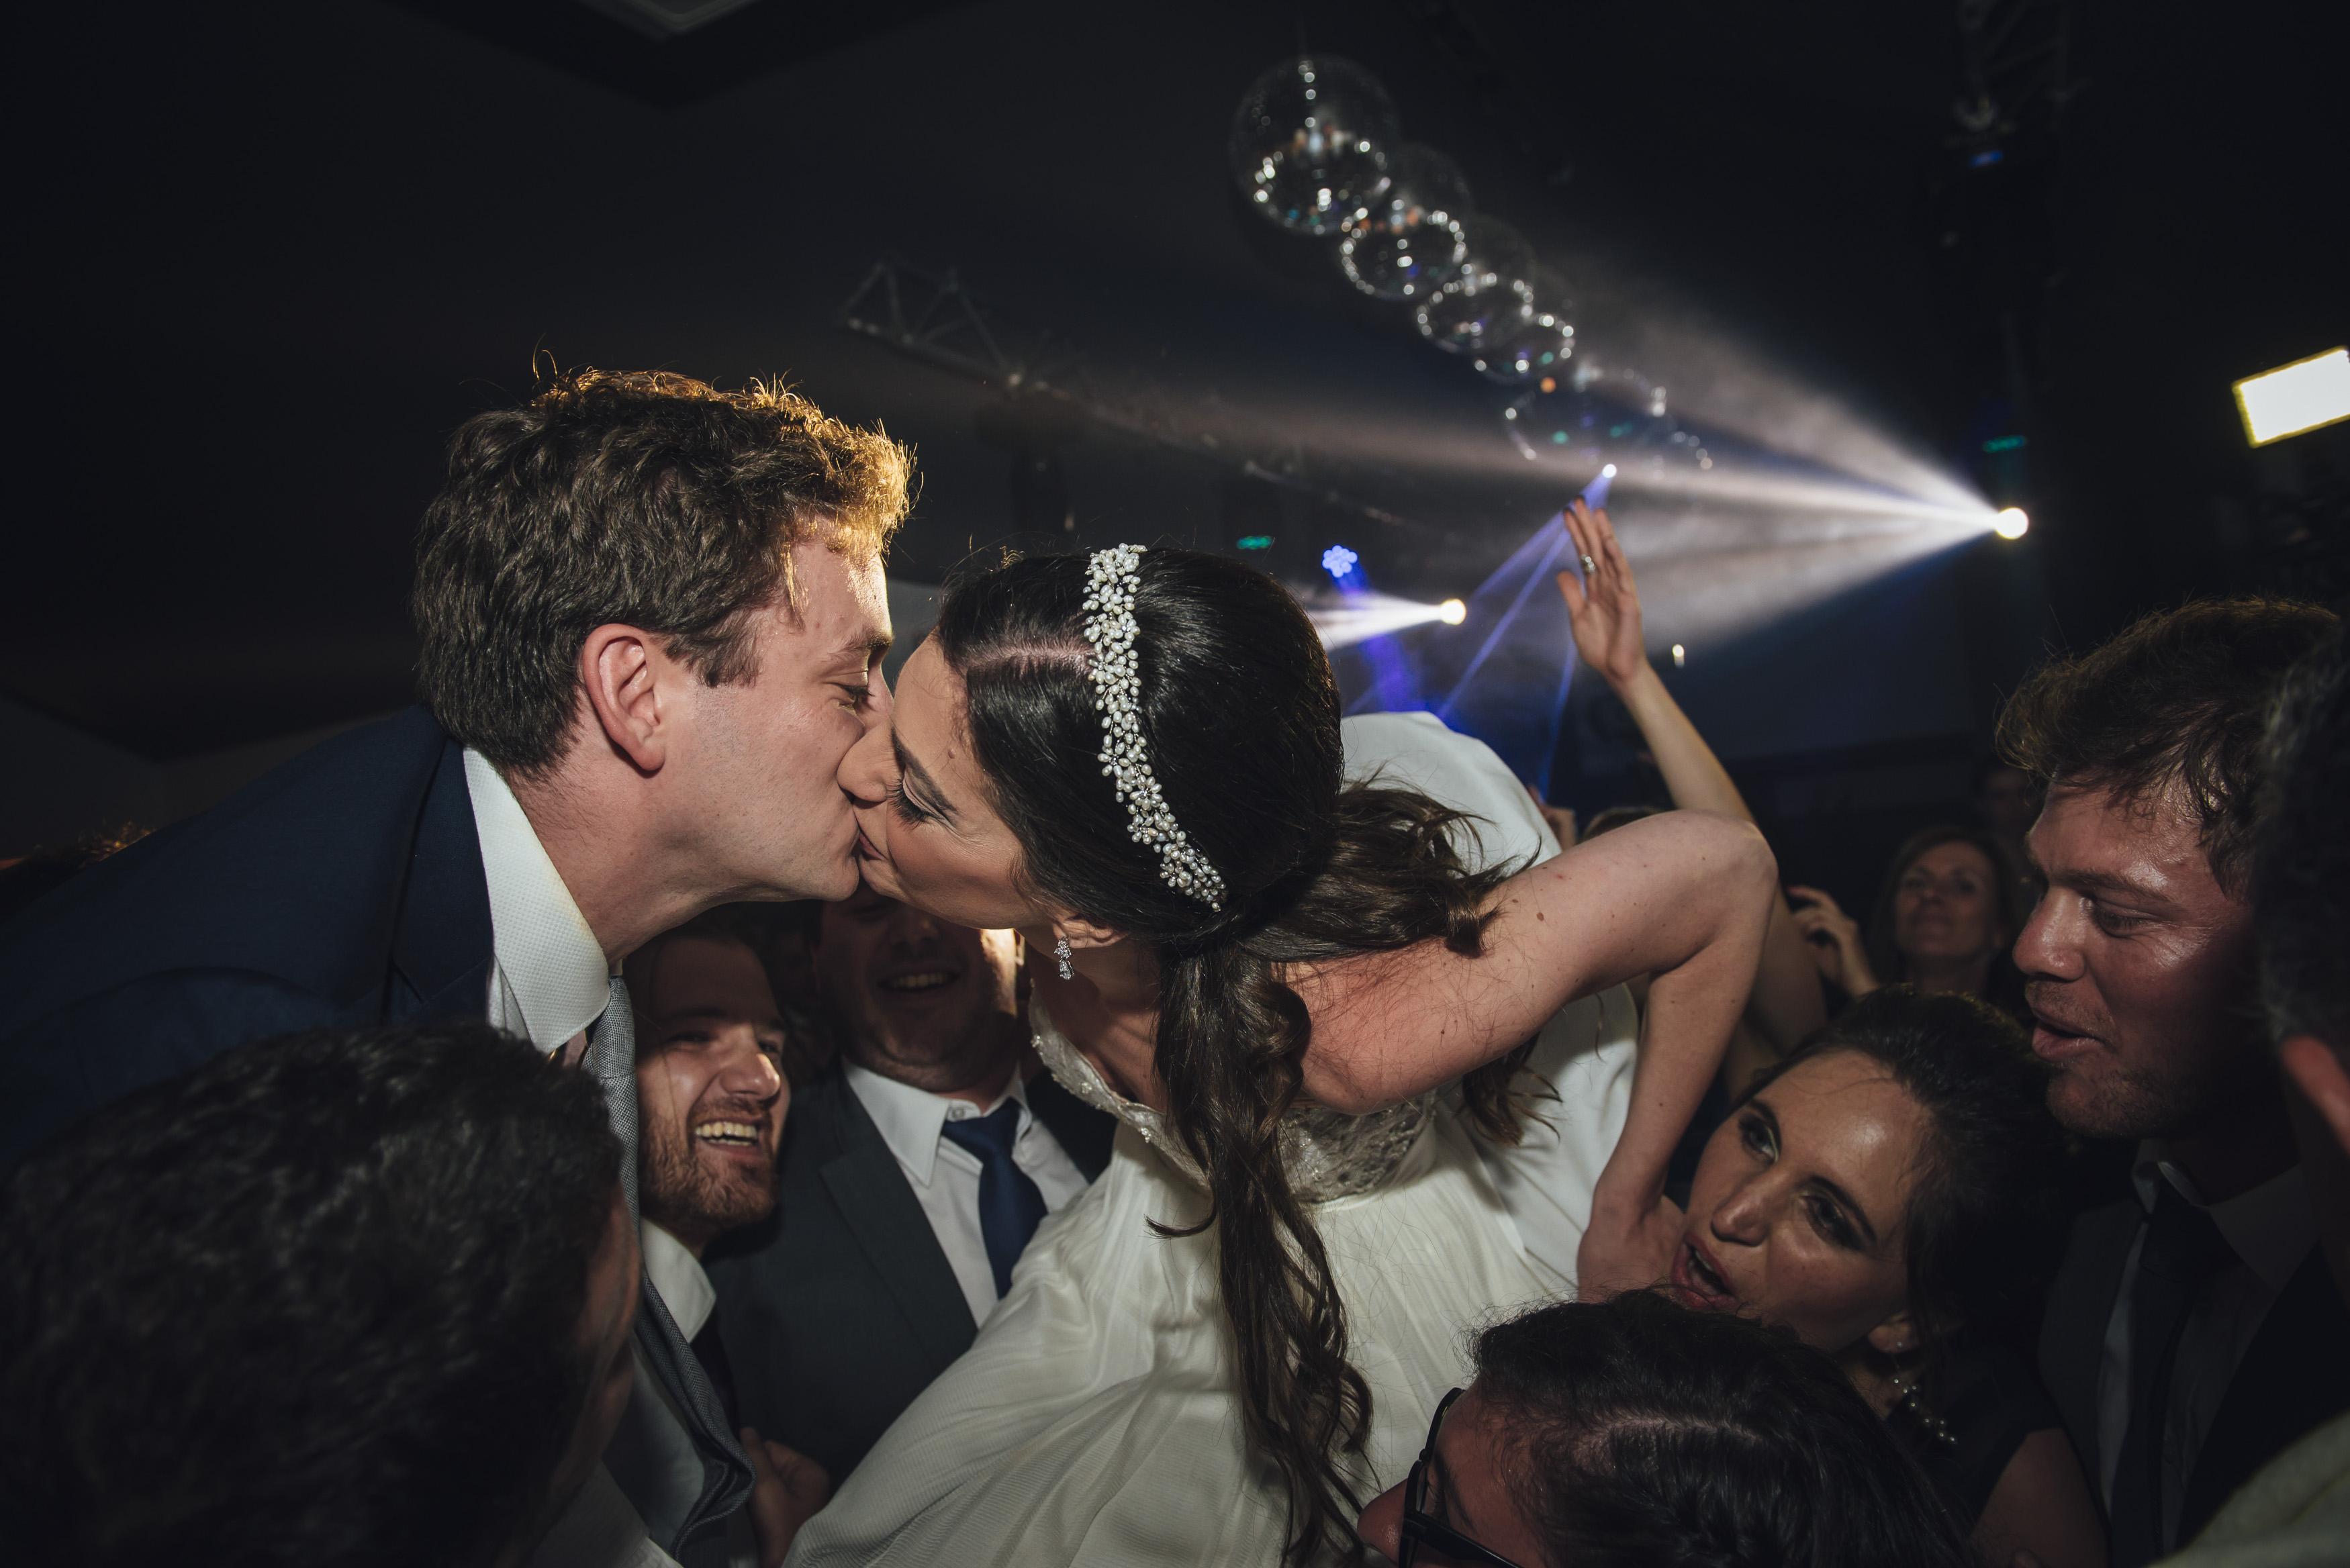 patricia-riba-boda-judia-uruguay-ionit-bryan-28